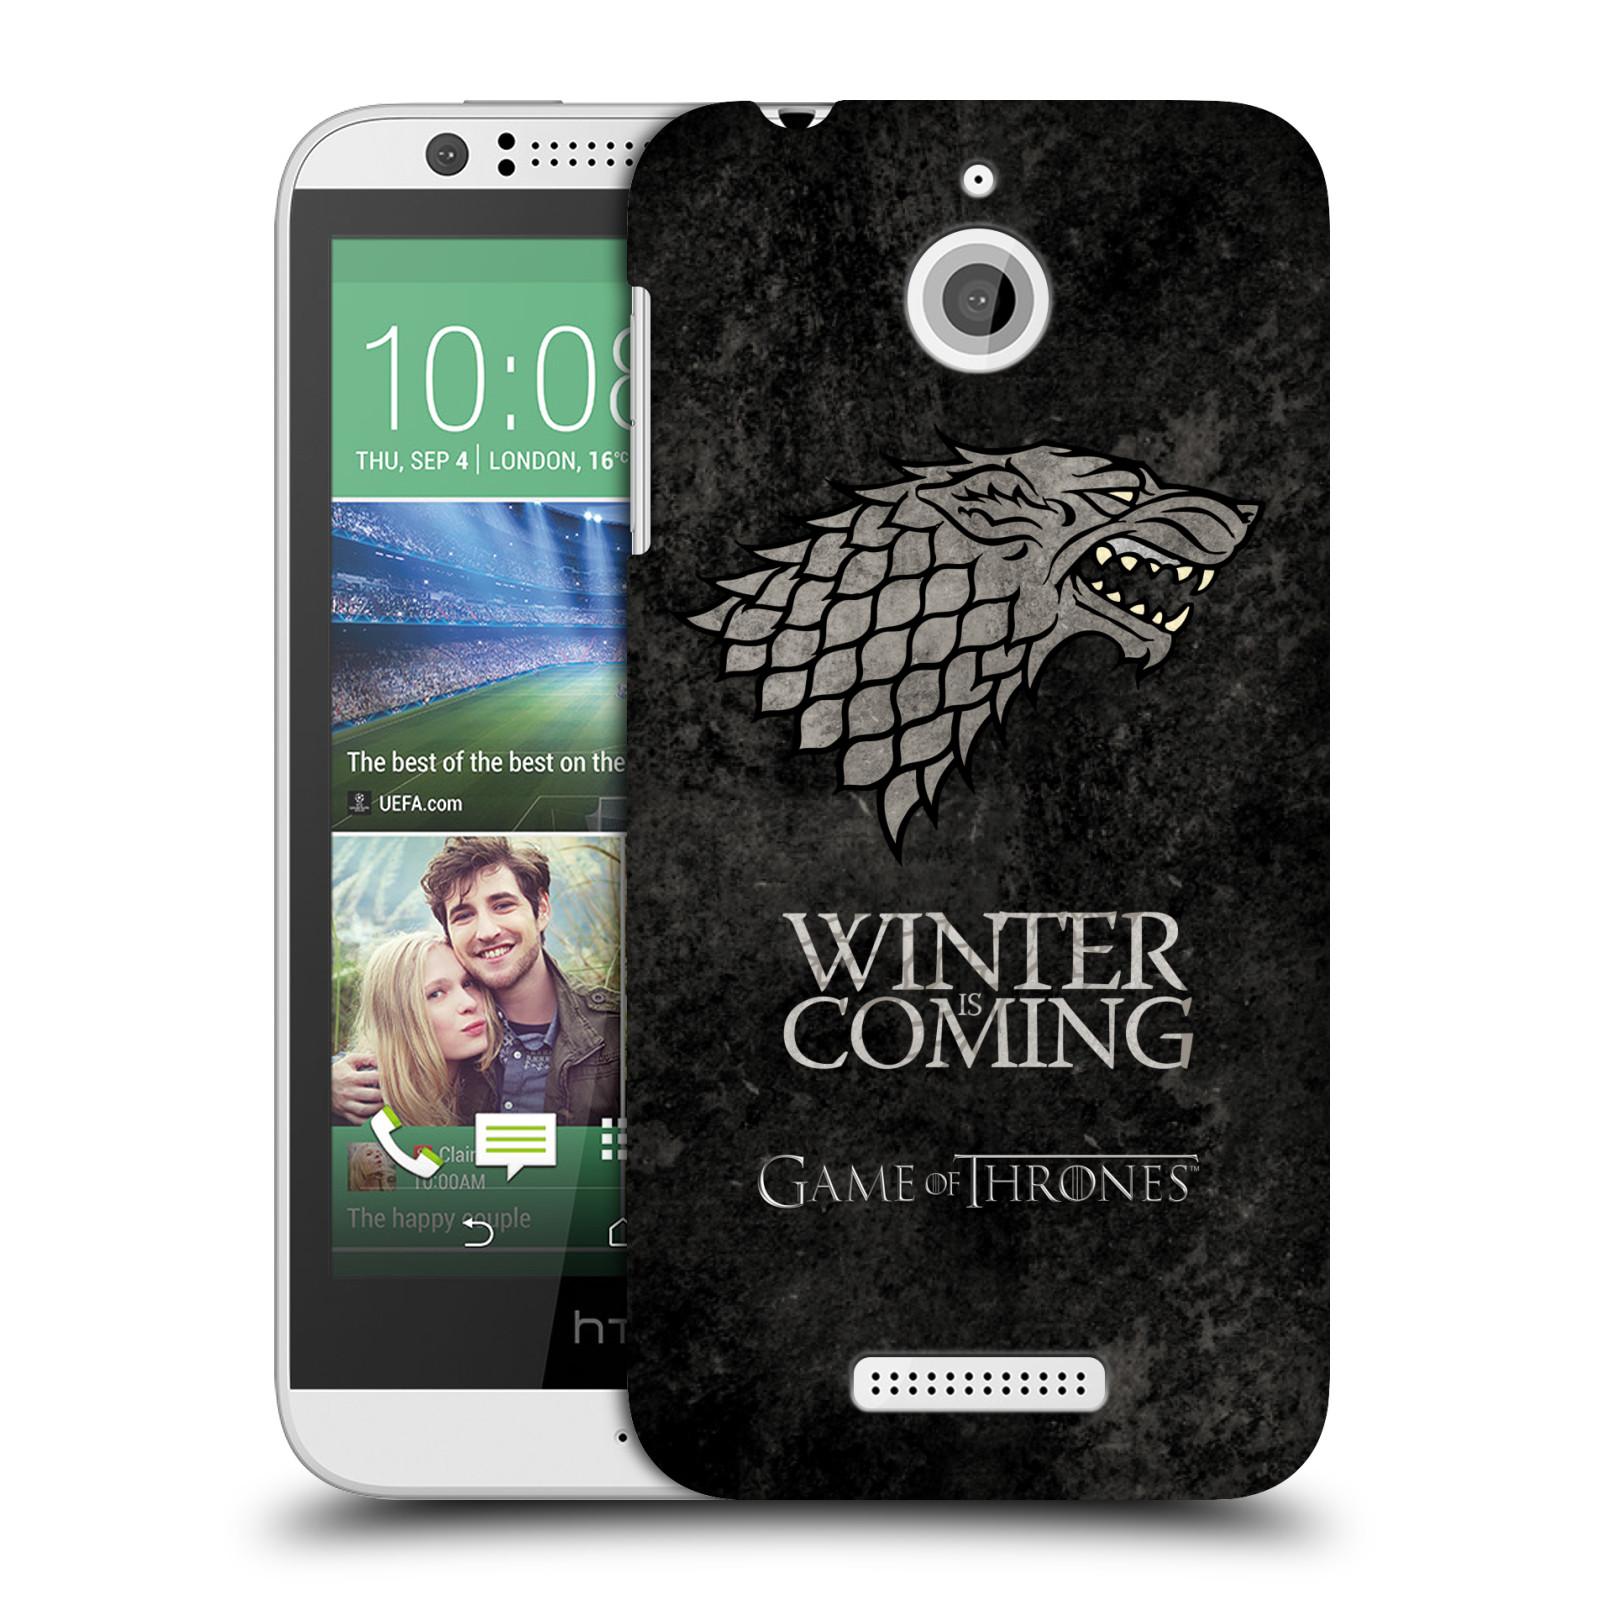 Plastové pouzdro na mobil HTC Desire 510 HEAD CASE Hra o trůny - Stark - Winter is coming